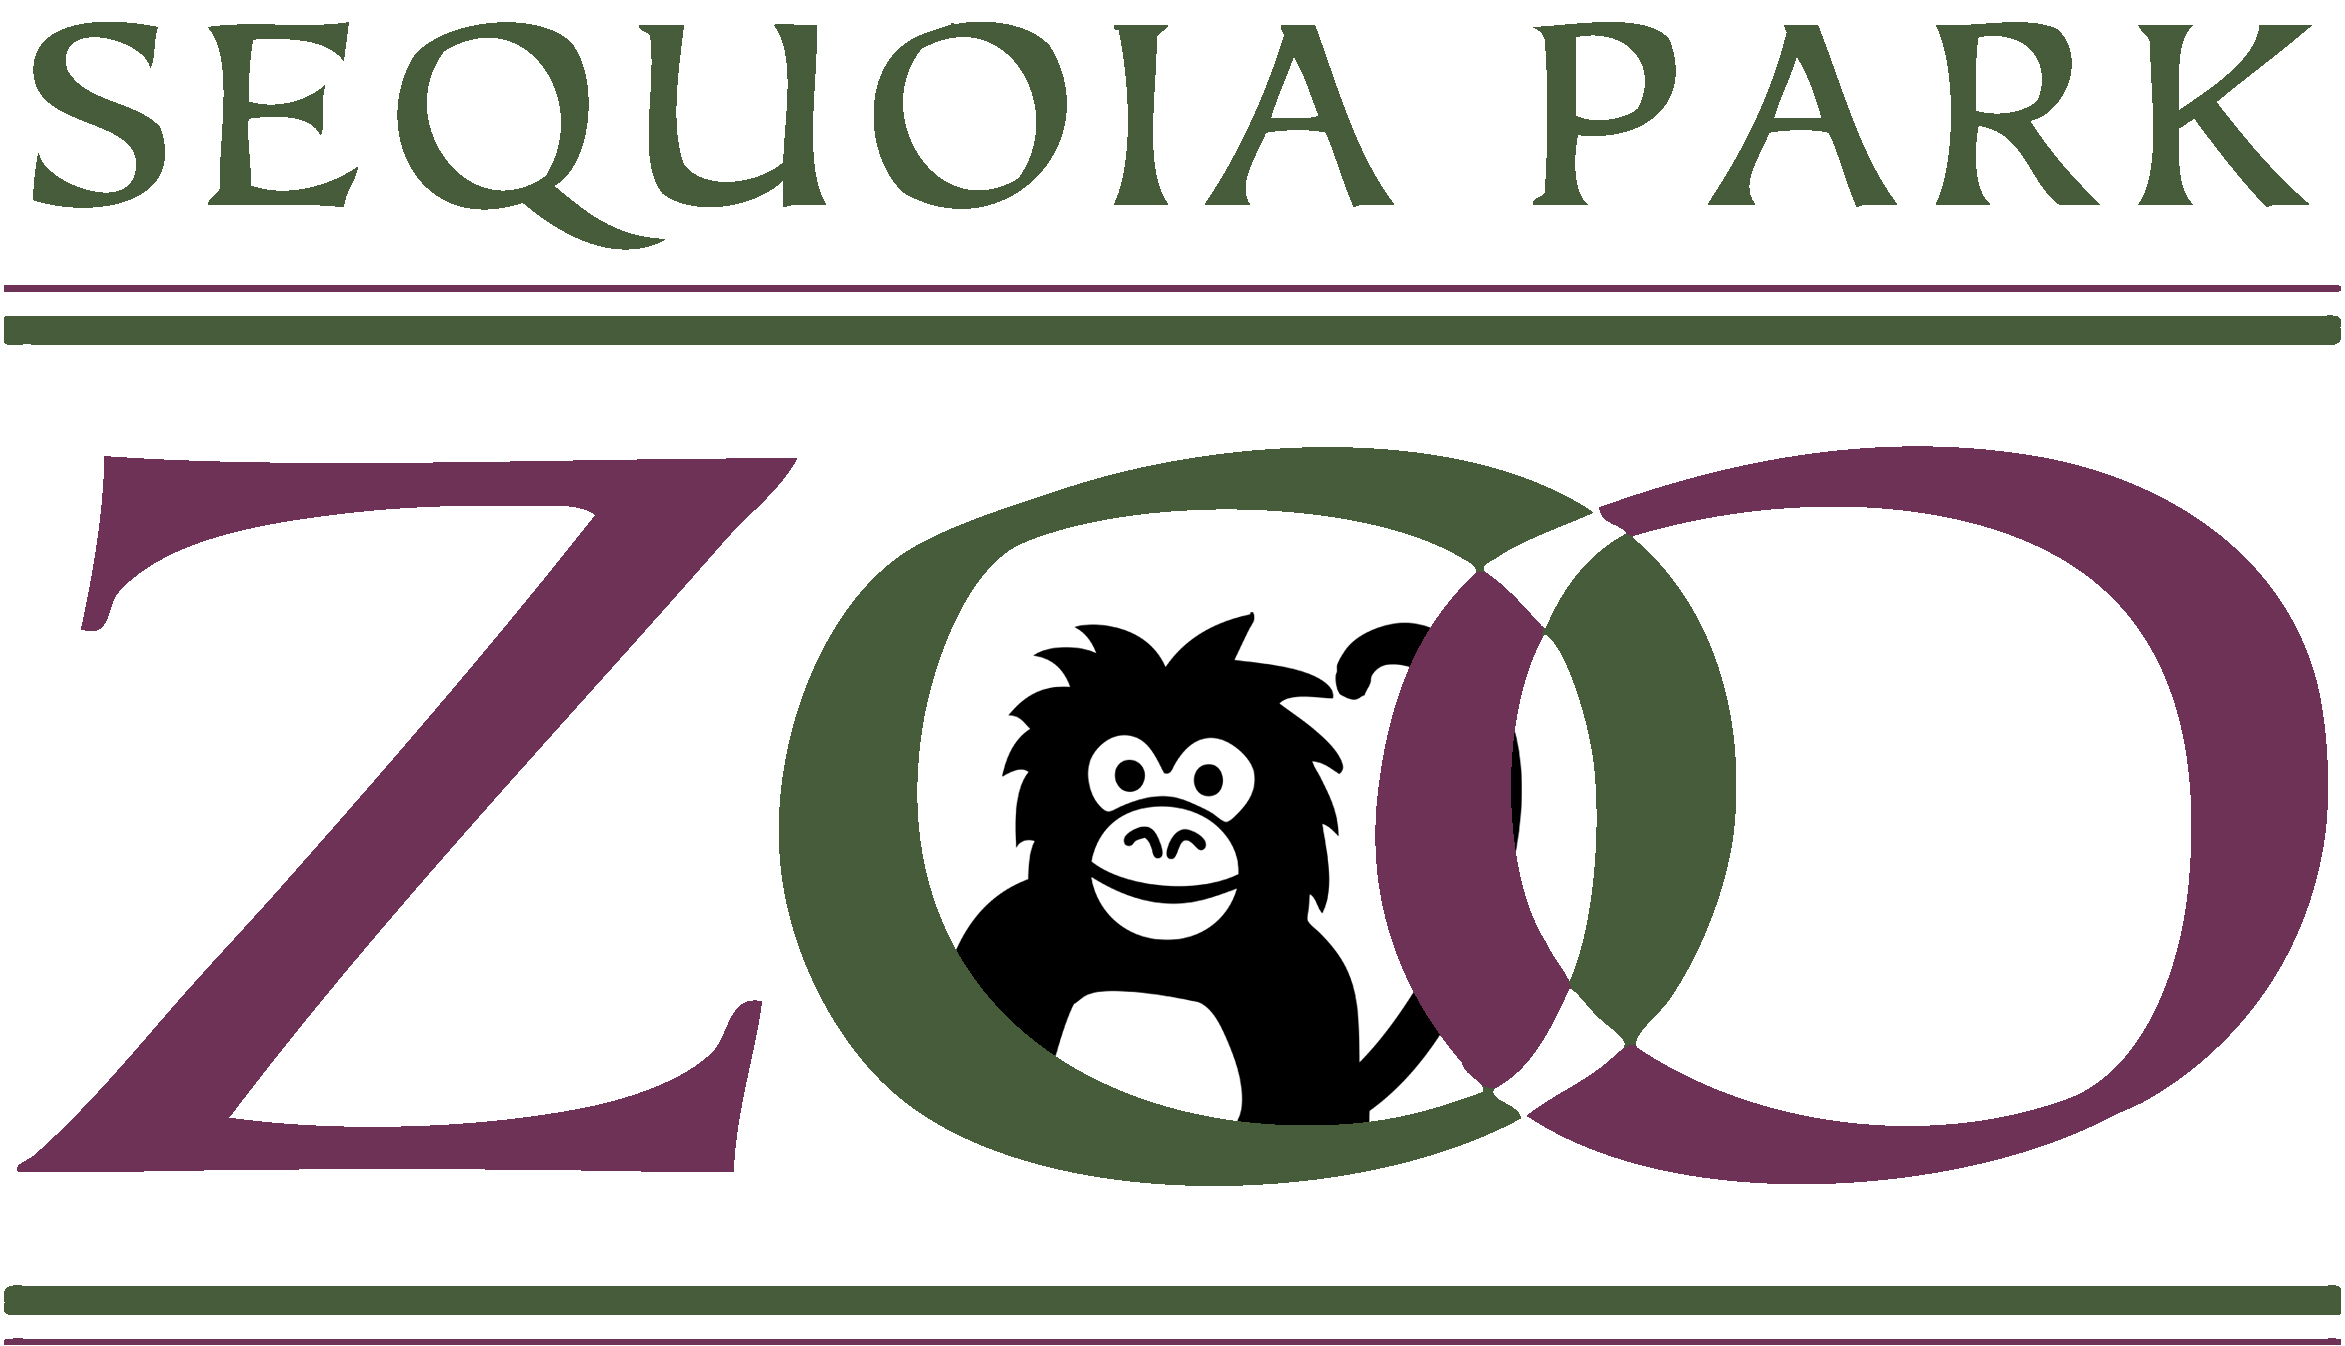 Sequoia Park Zoo.jpg